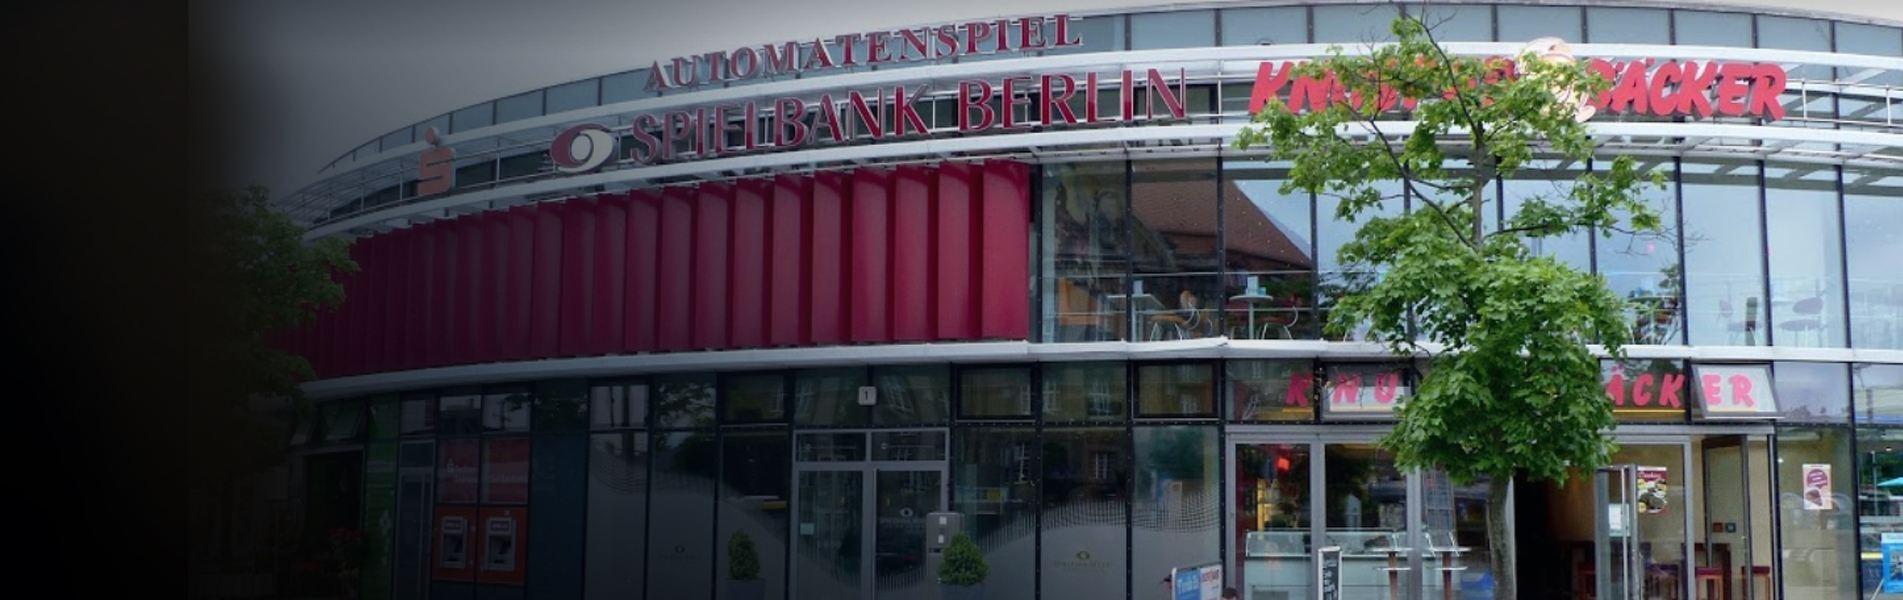 Spielbank Automatenspiel Enschede - 20708